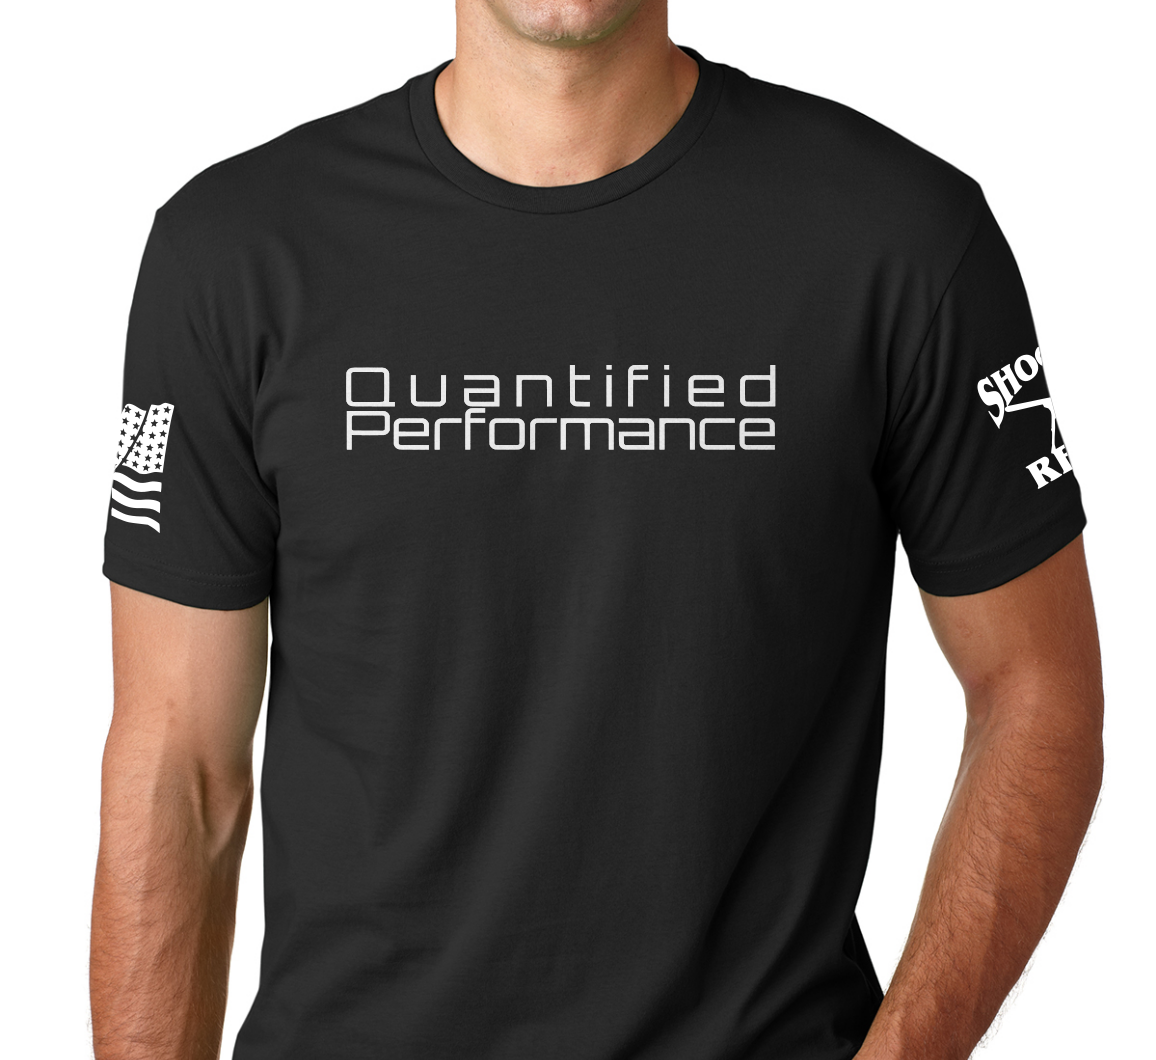 Quantified Performance Shirt